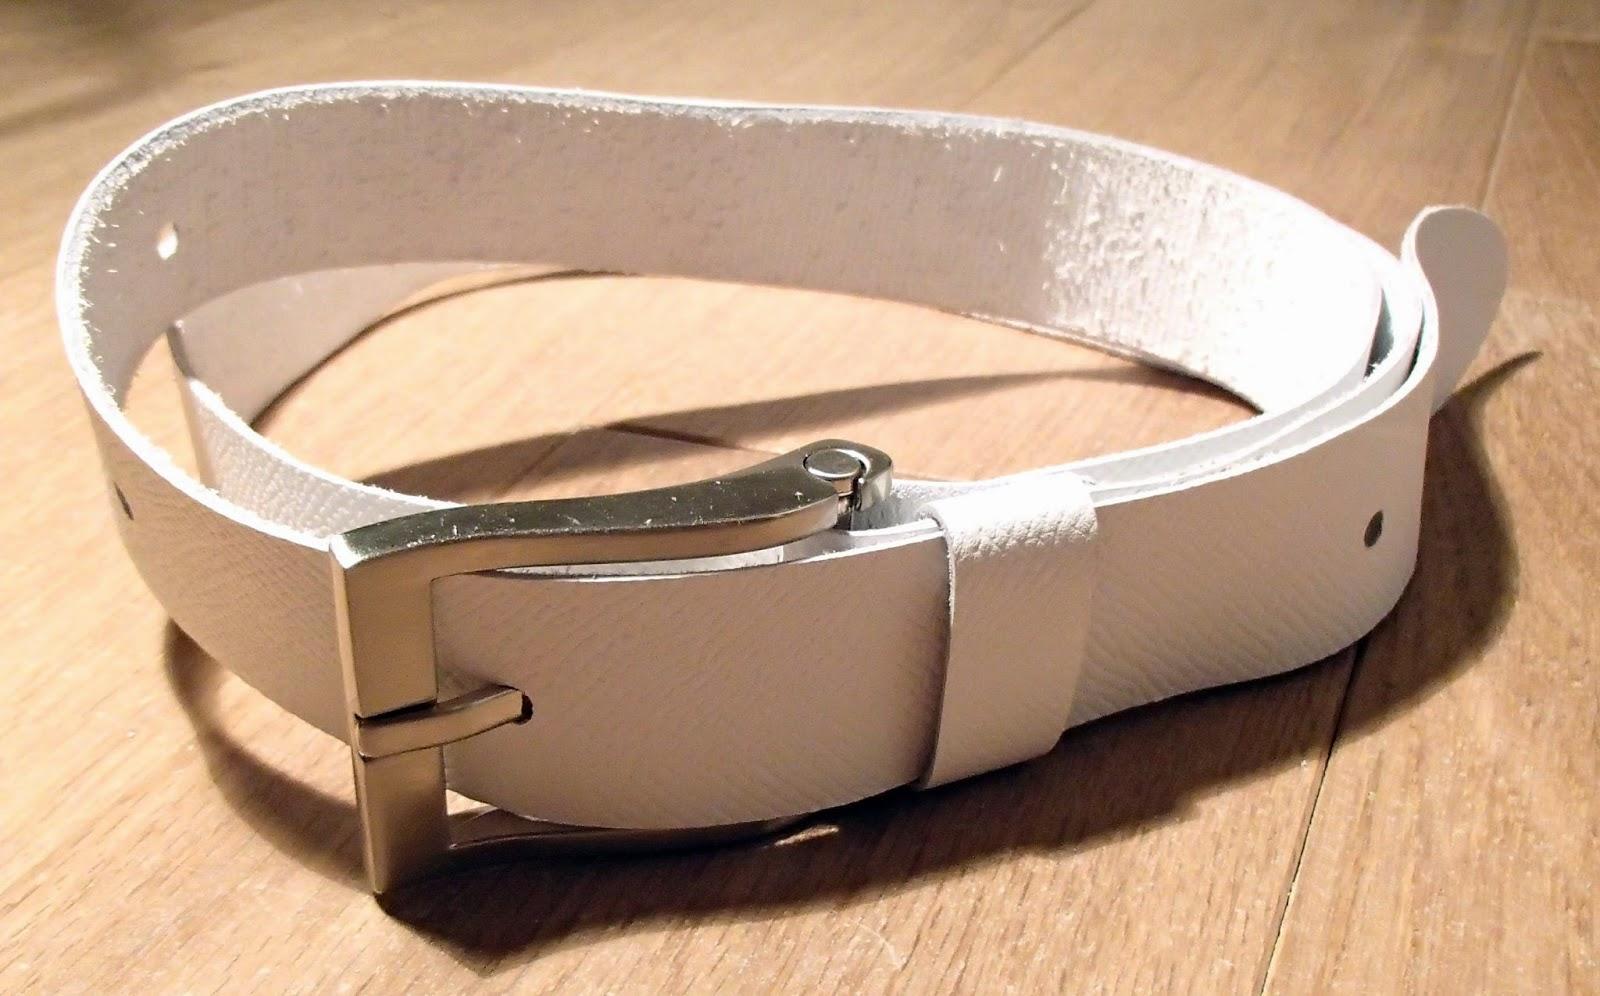 Vue globale de la ceinture en cuir blanc